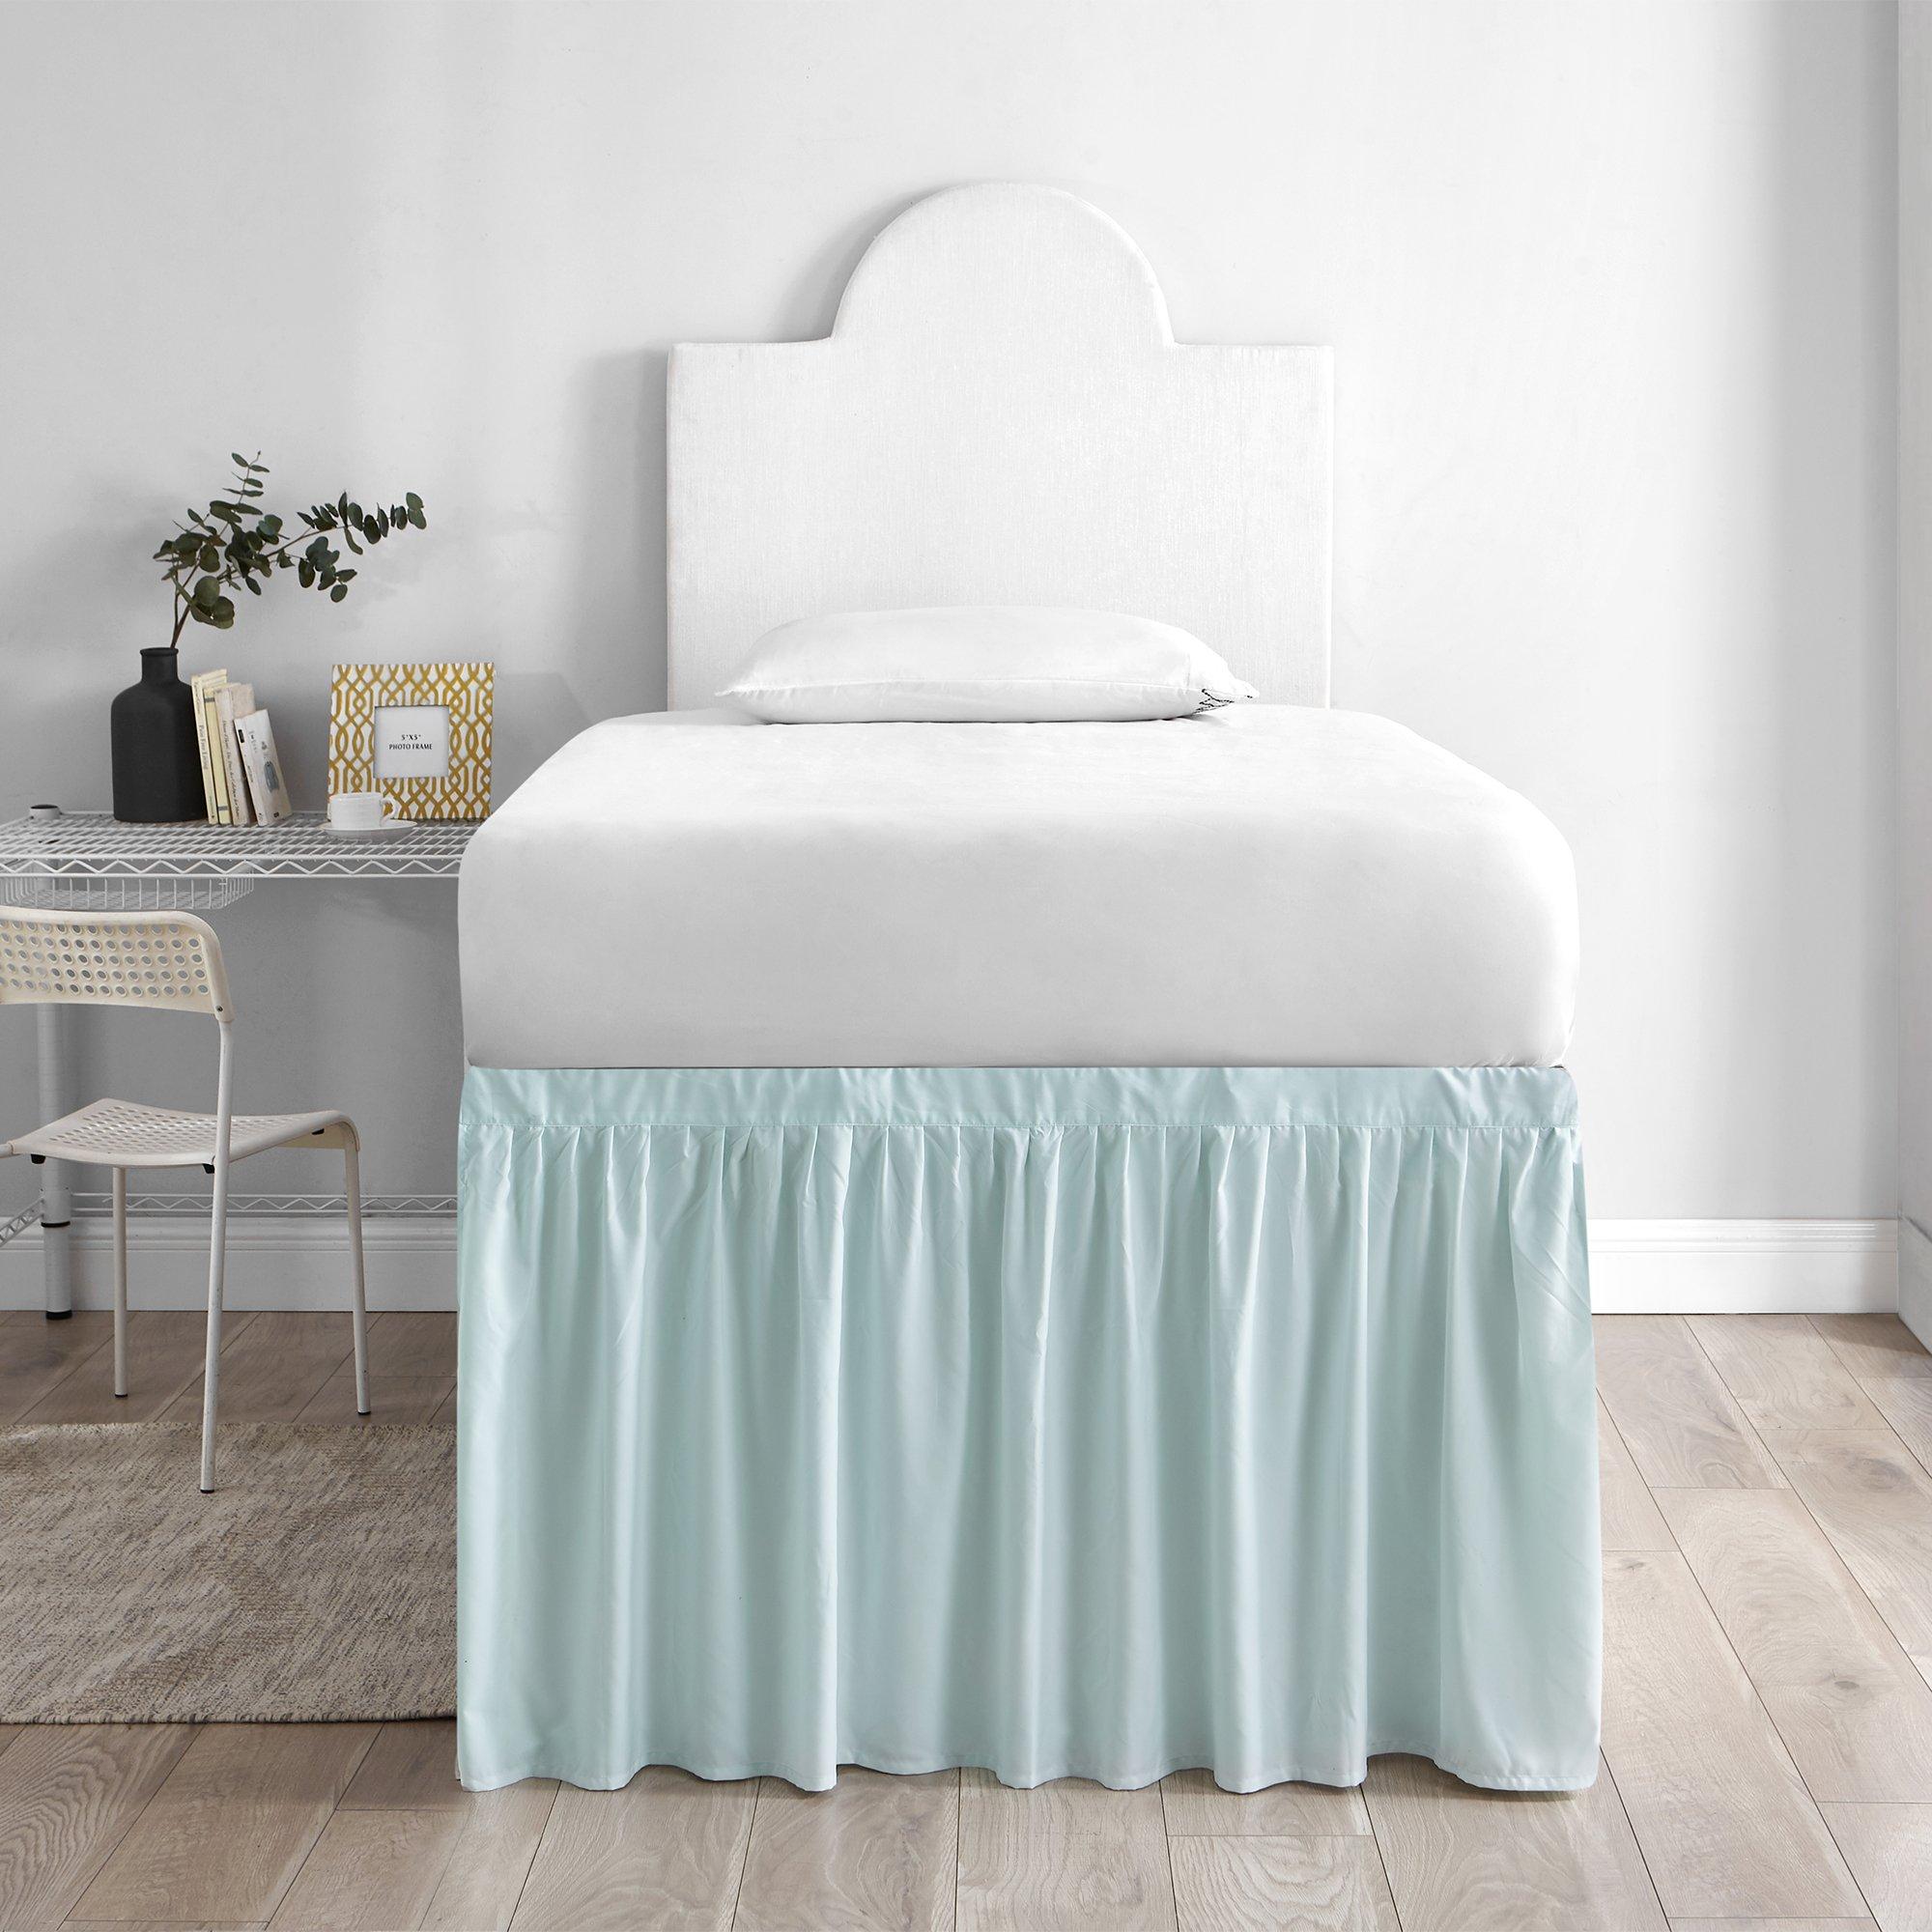 DormCo Bed Skirt Twin XL (3 Panel Set) - Hint of Mint